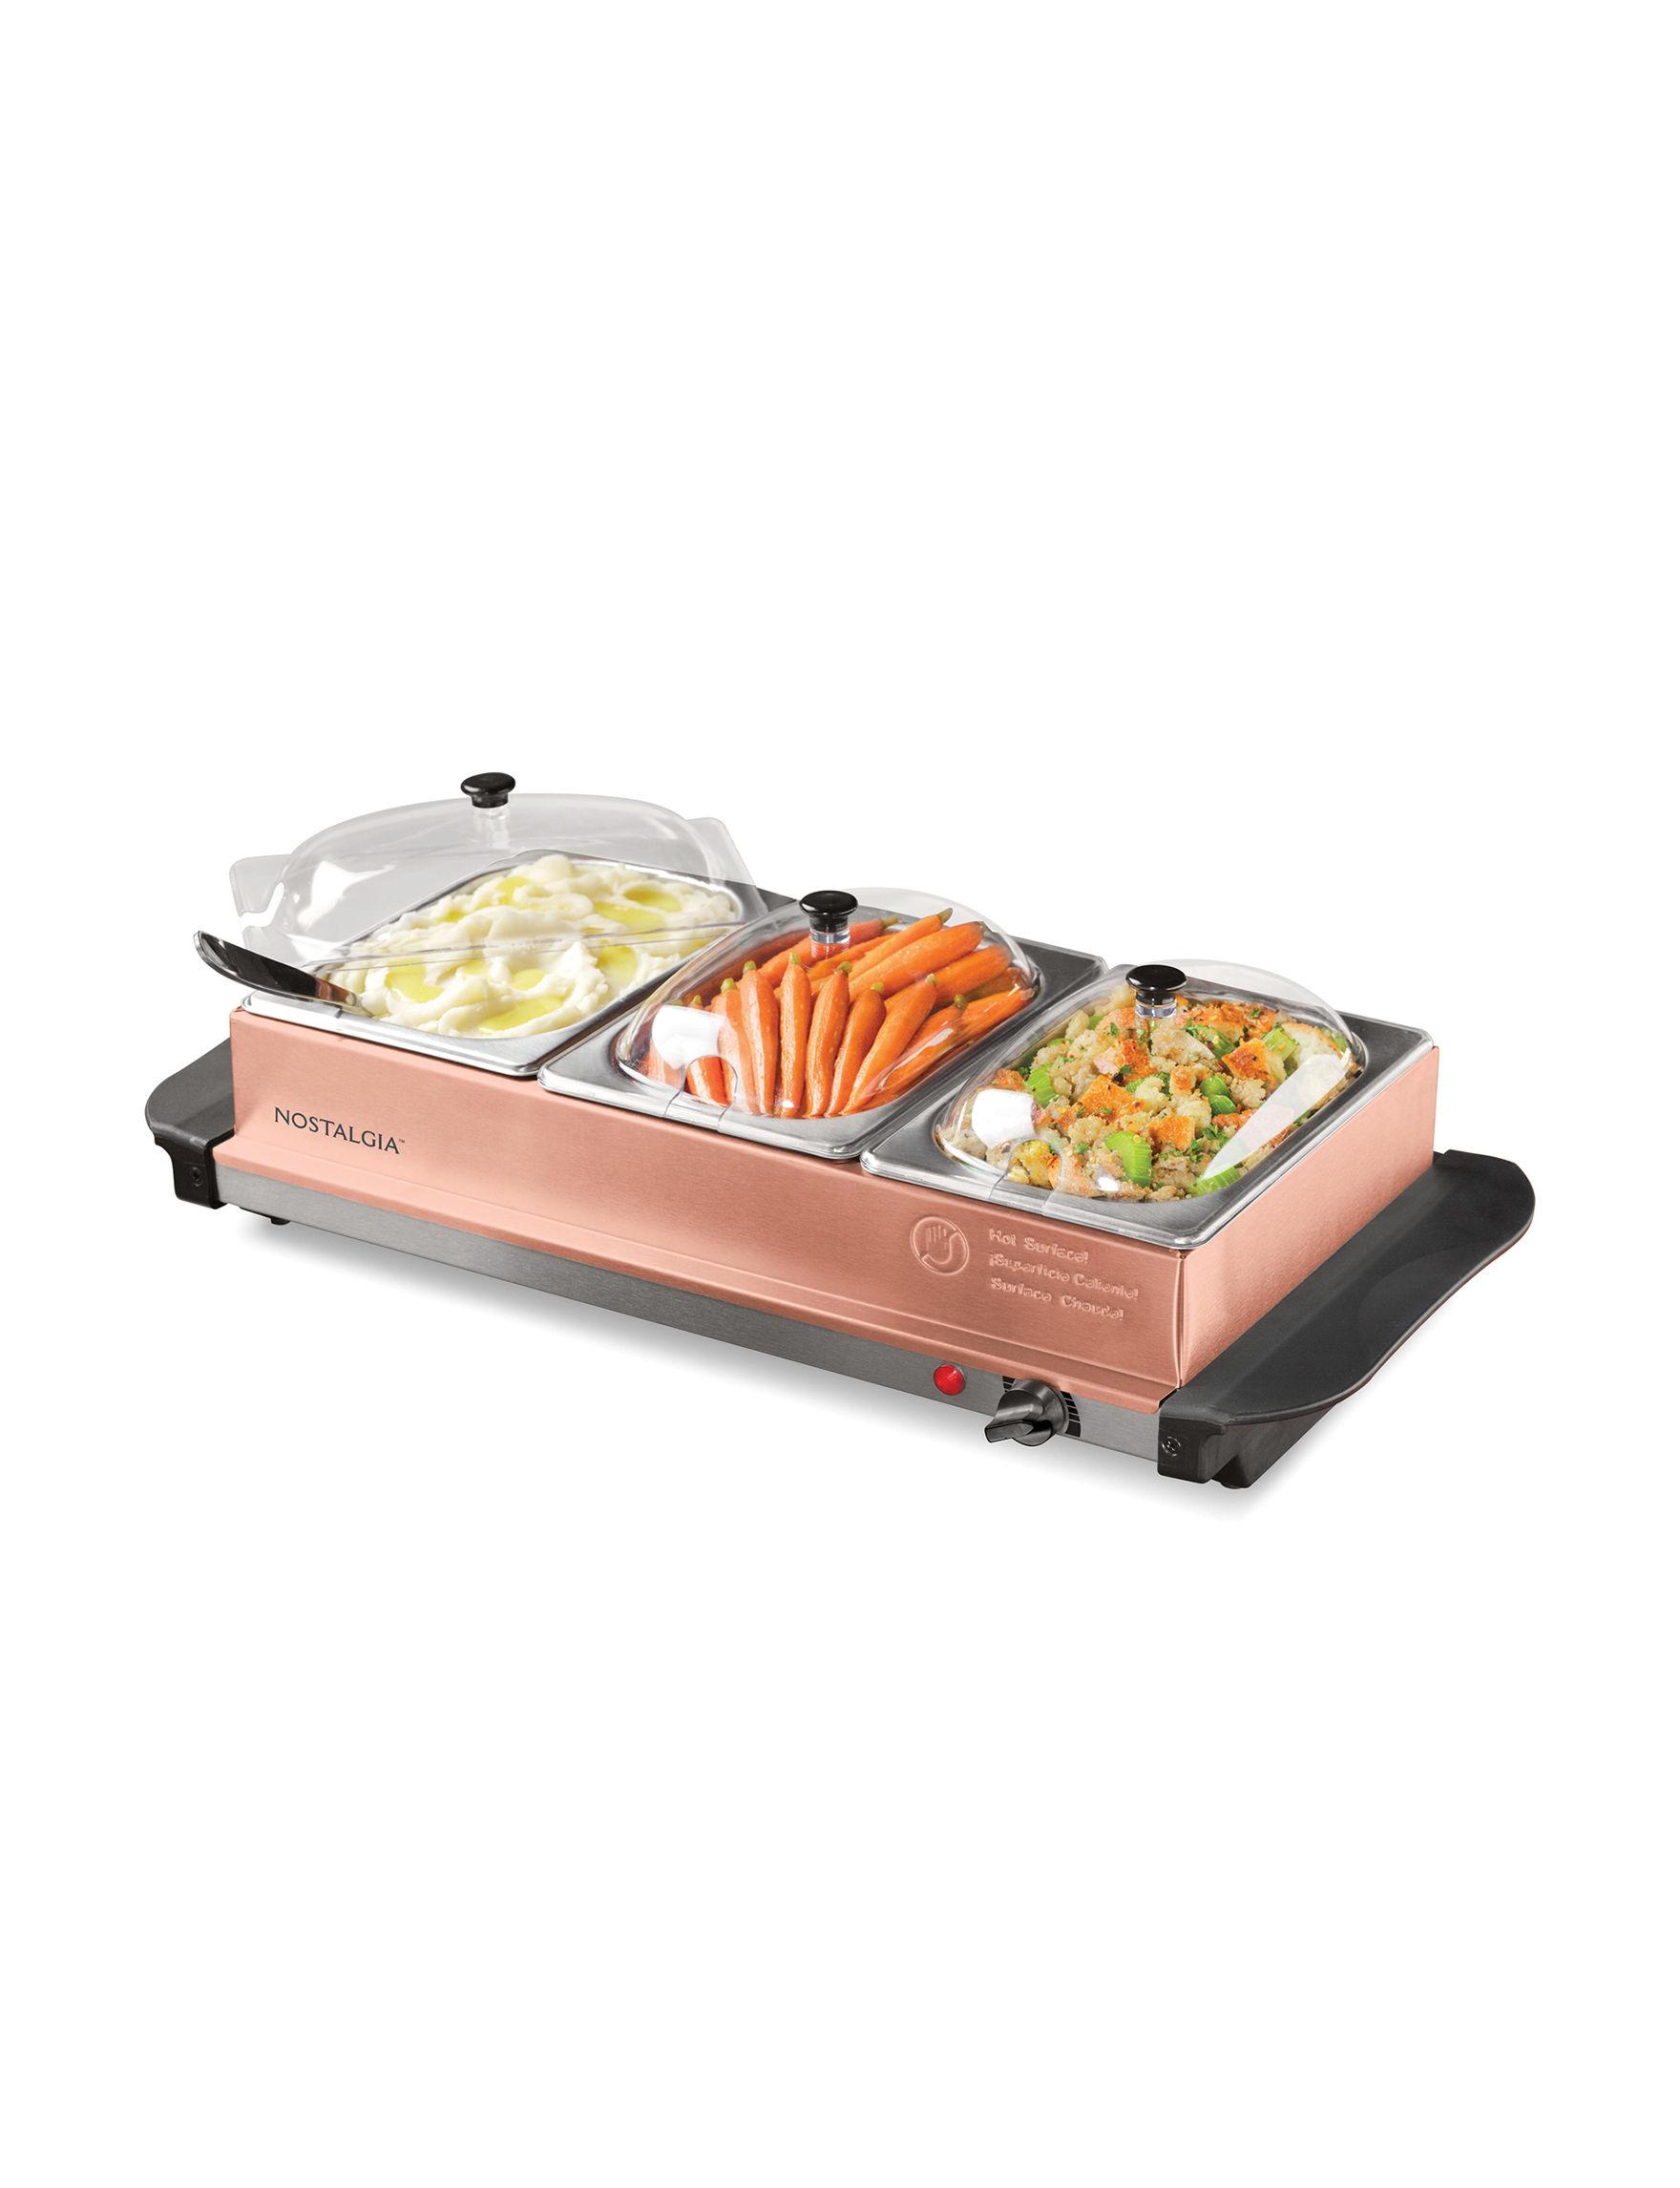 Nostalgia Electrics Copper Serving Platters & Trays Kitchen Appliances